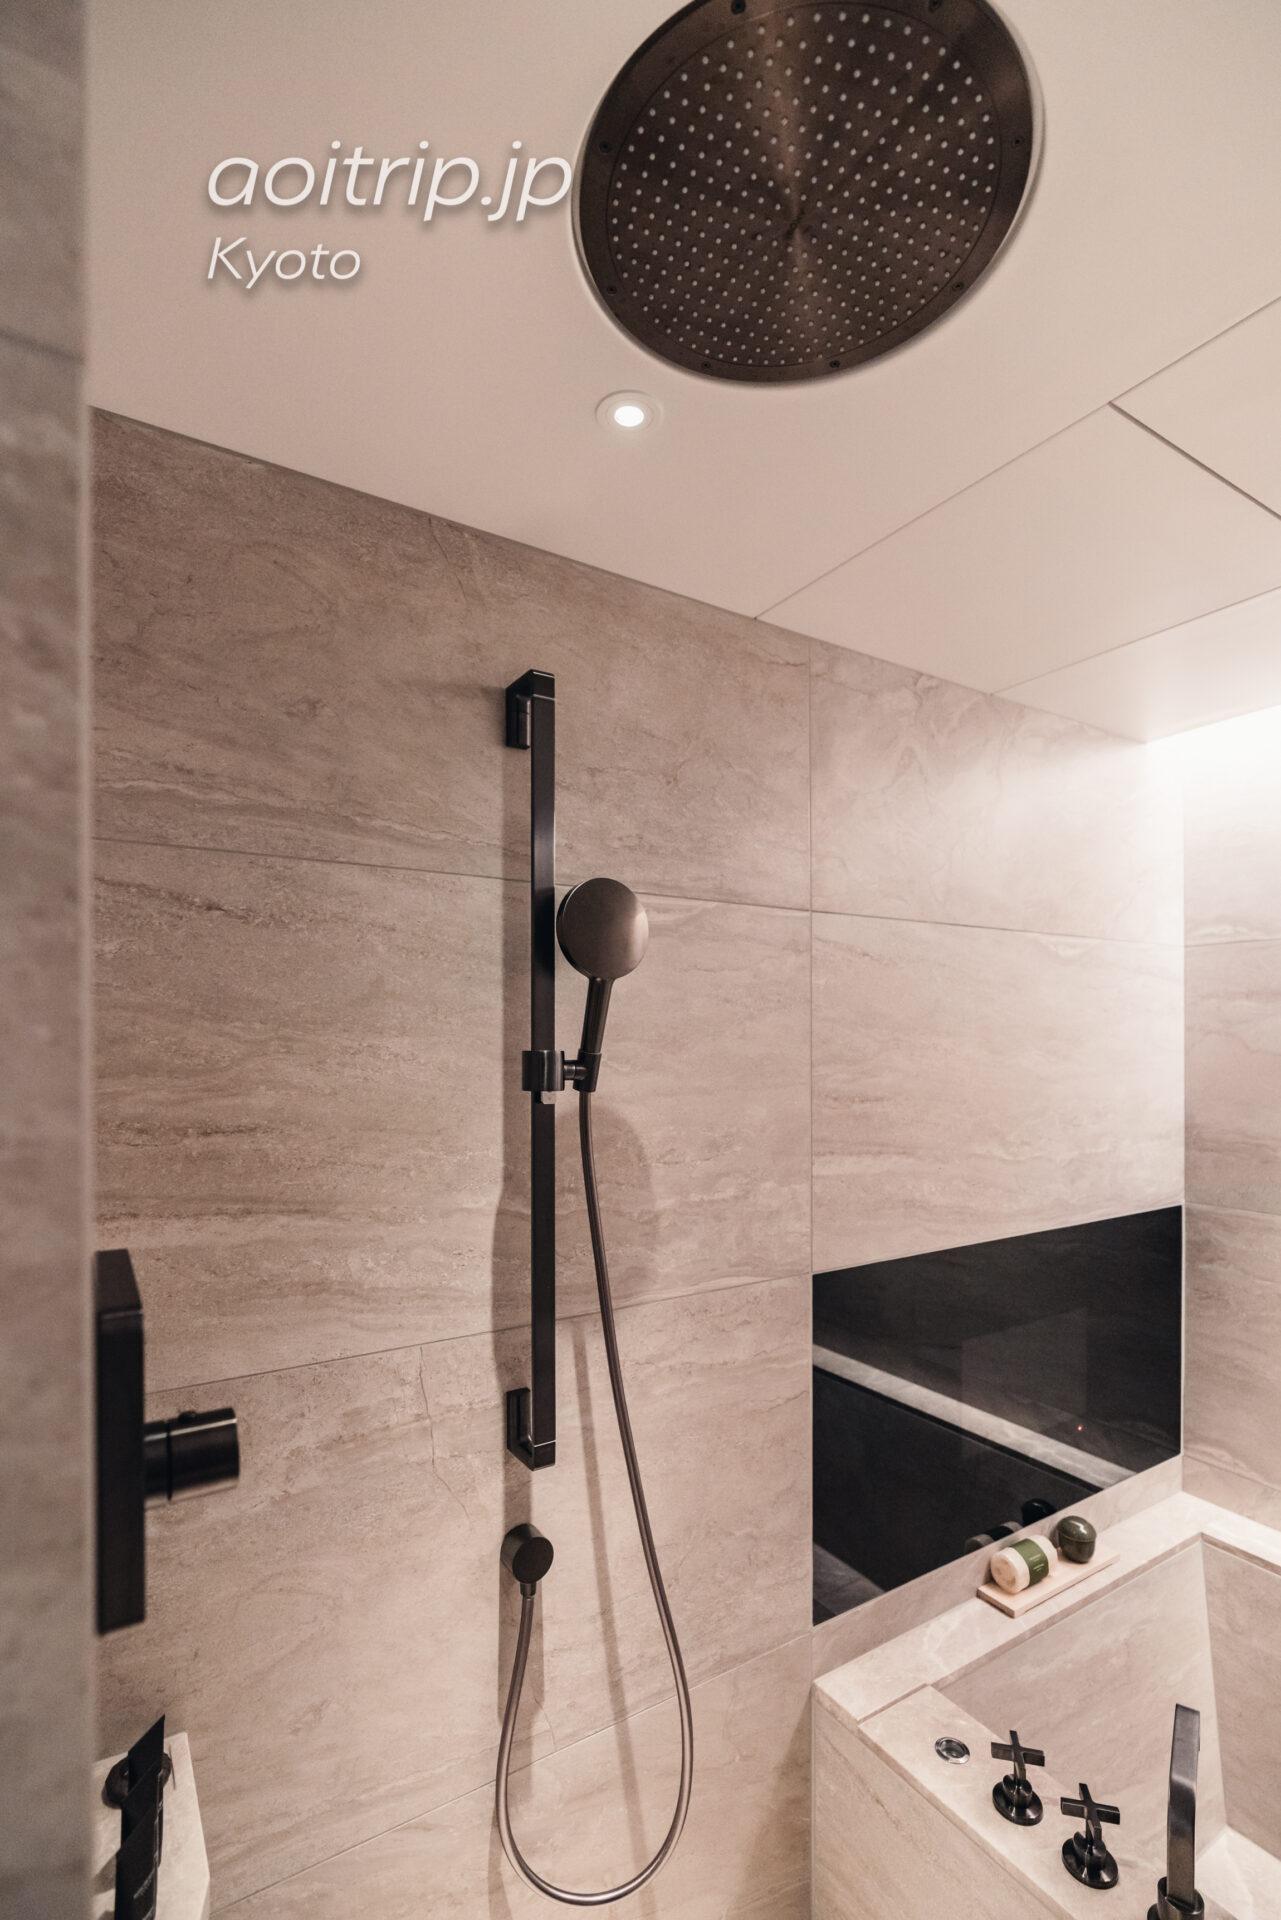 HOTEL THE MITSUI KYOTO デラックススイートのシャワー